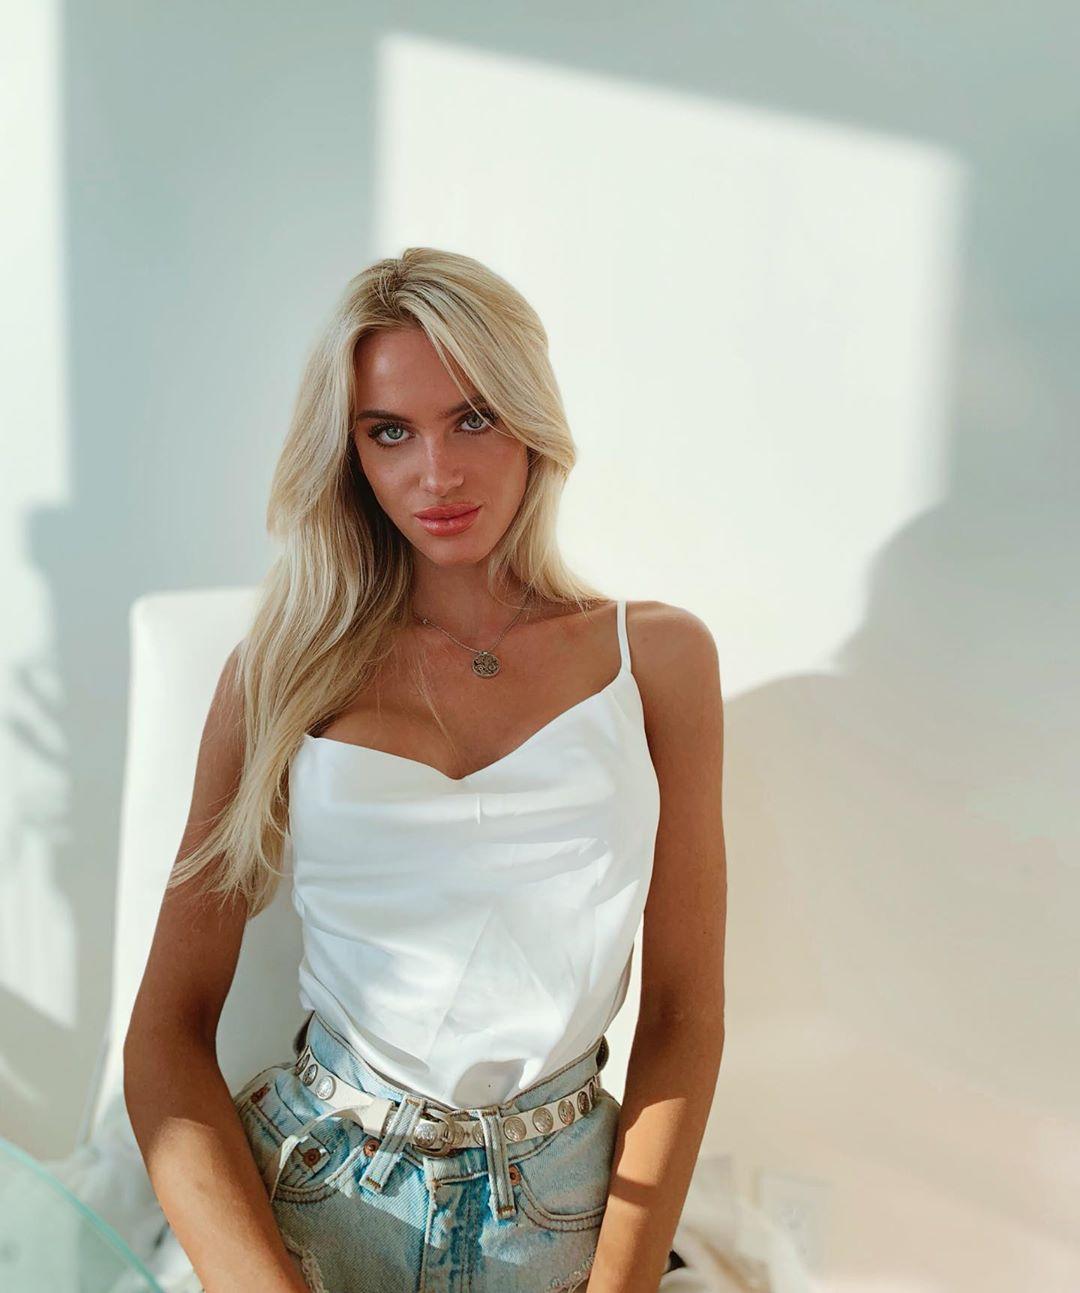 Emma-Davies-Wallpapers-Insta-Fit-Bio-4